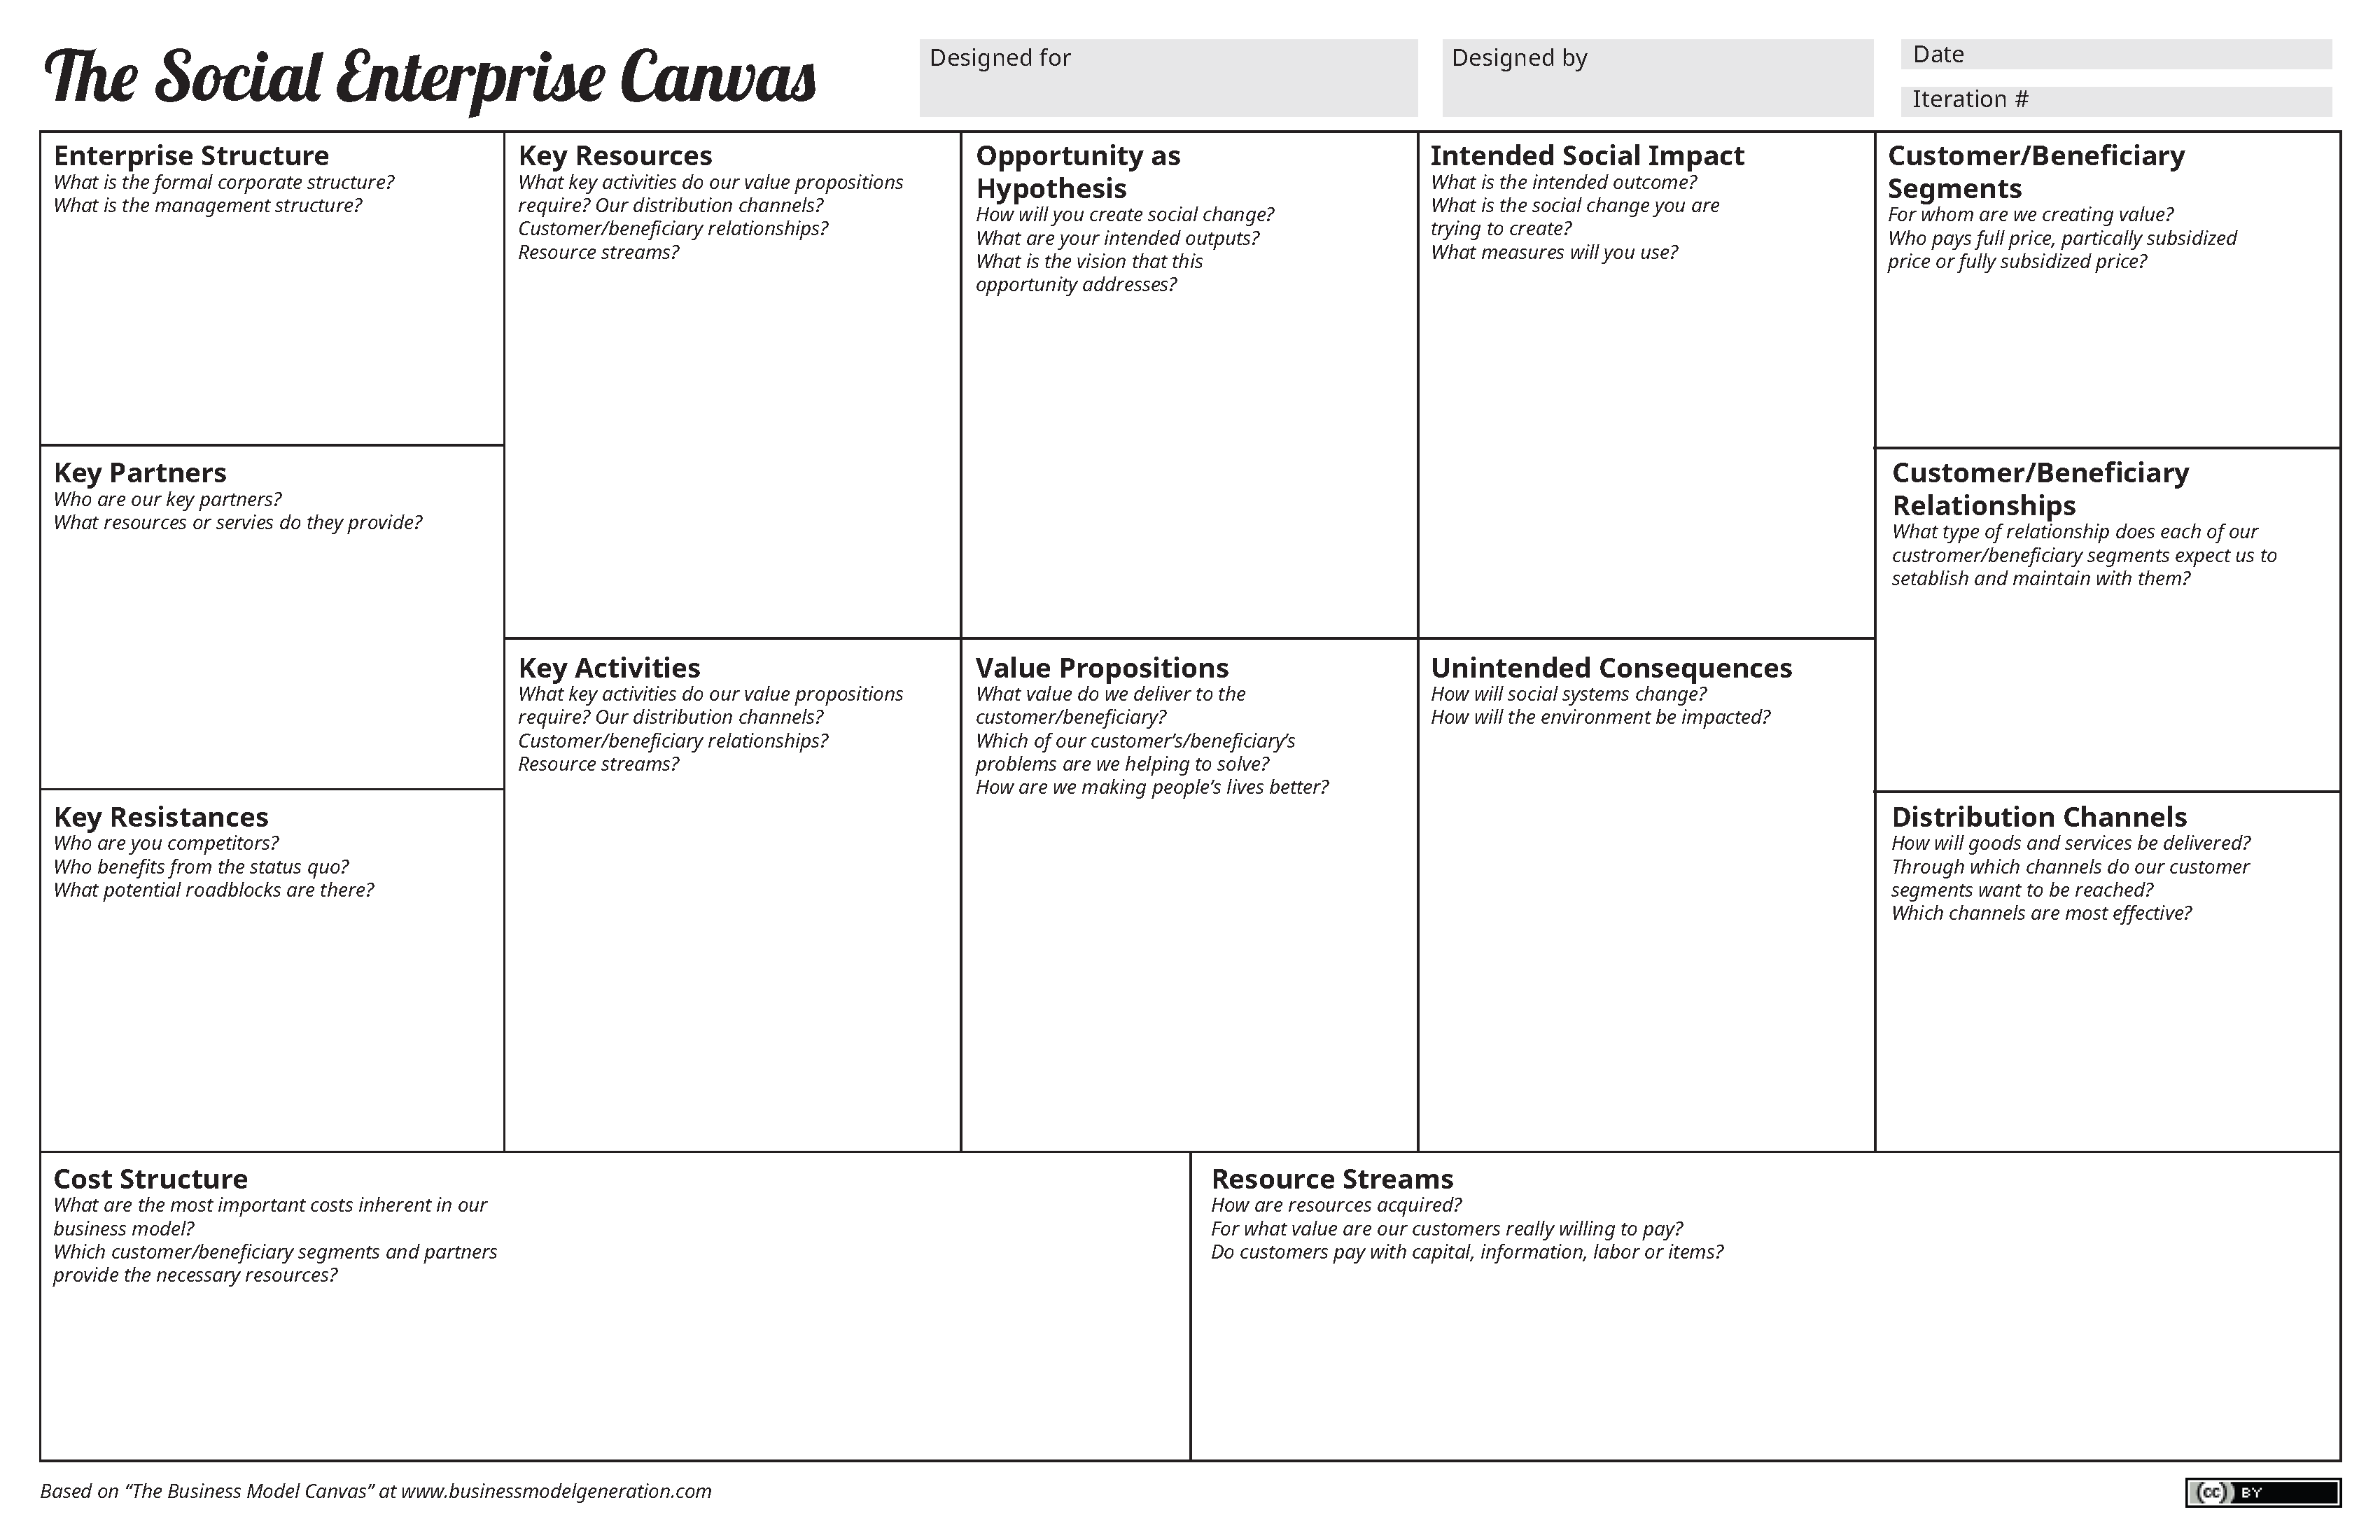 Social Enterprise Canvas & Model » Danielle Olson's MFA